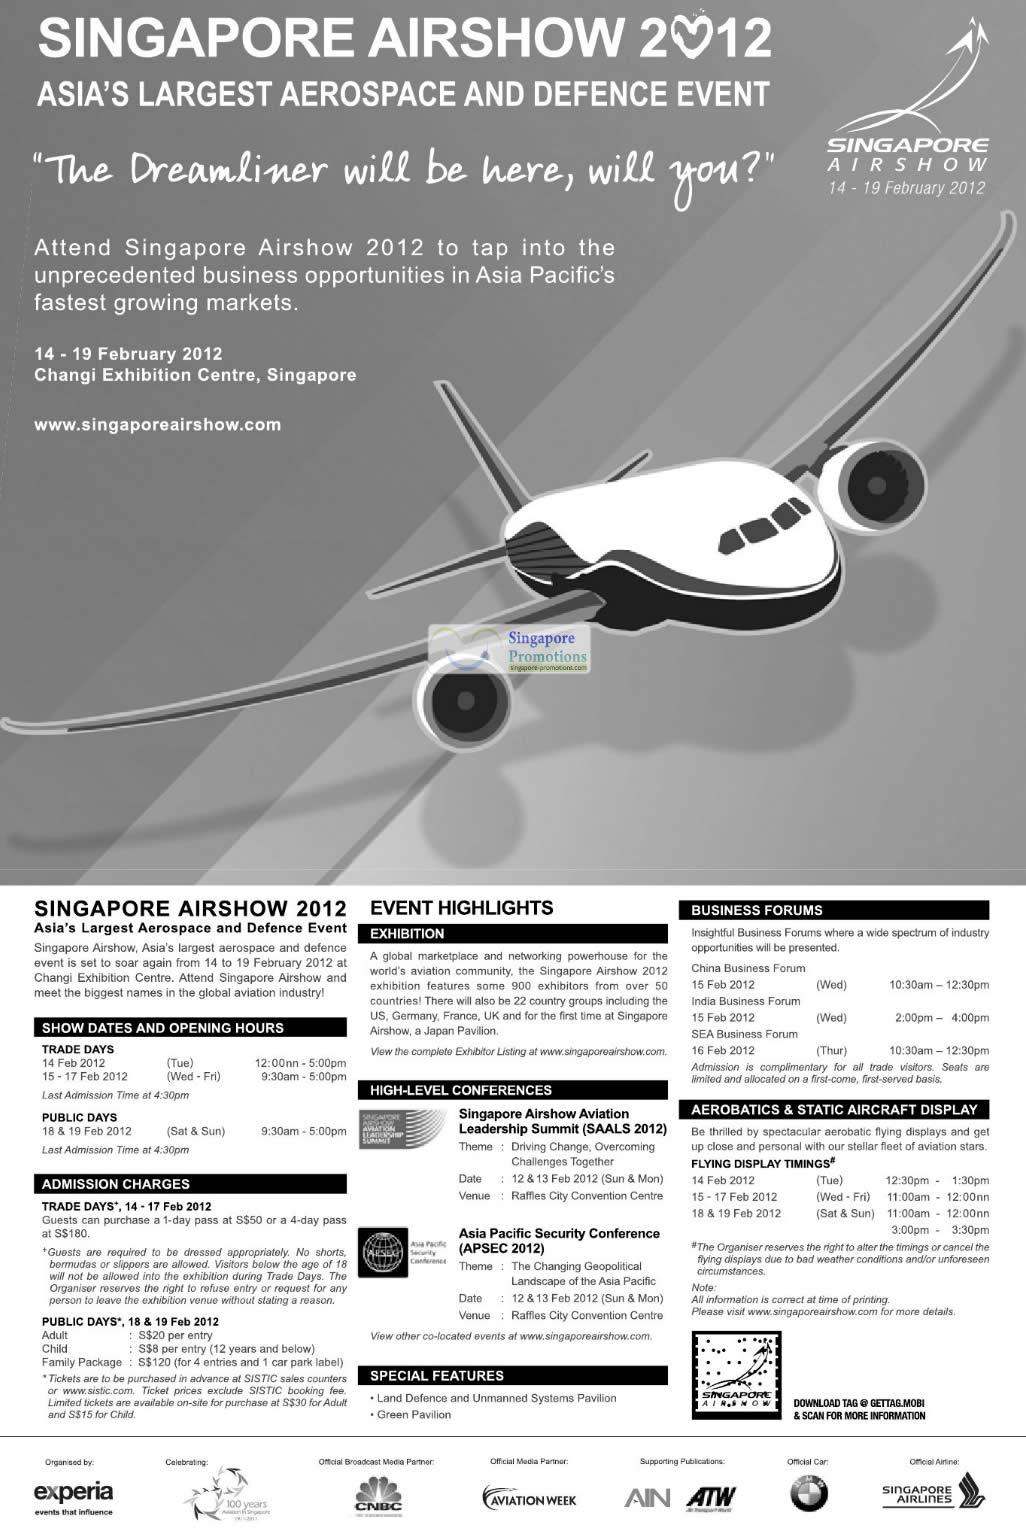 Show Details, Highlights, Forums, Conferences, Aerobatics, Displays